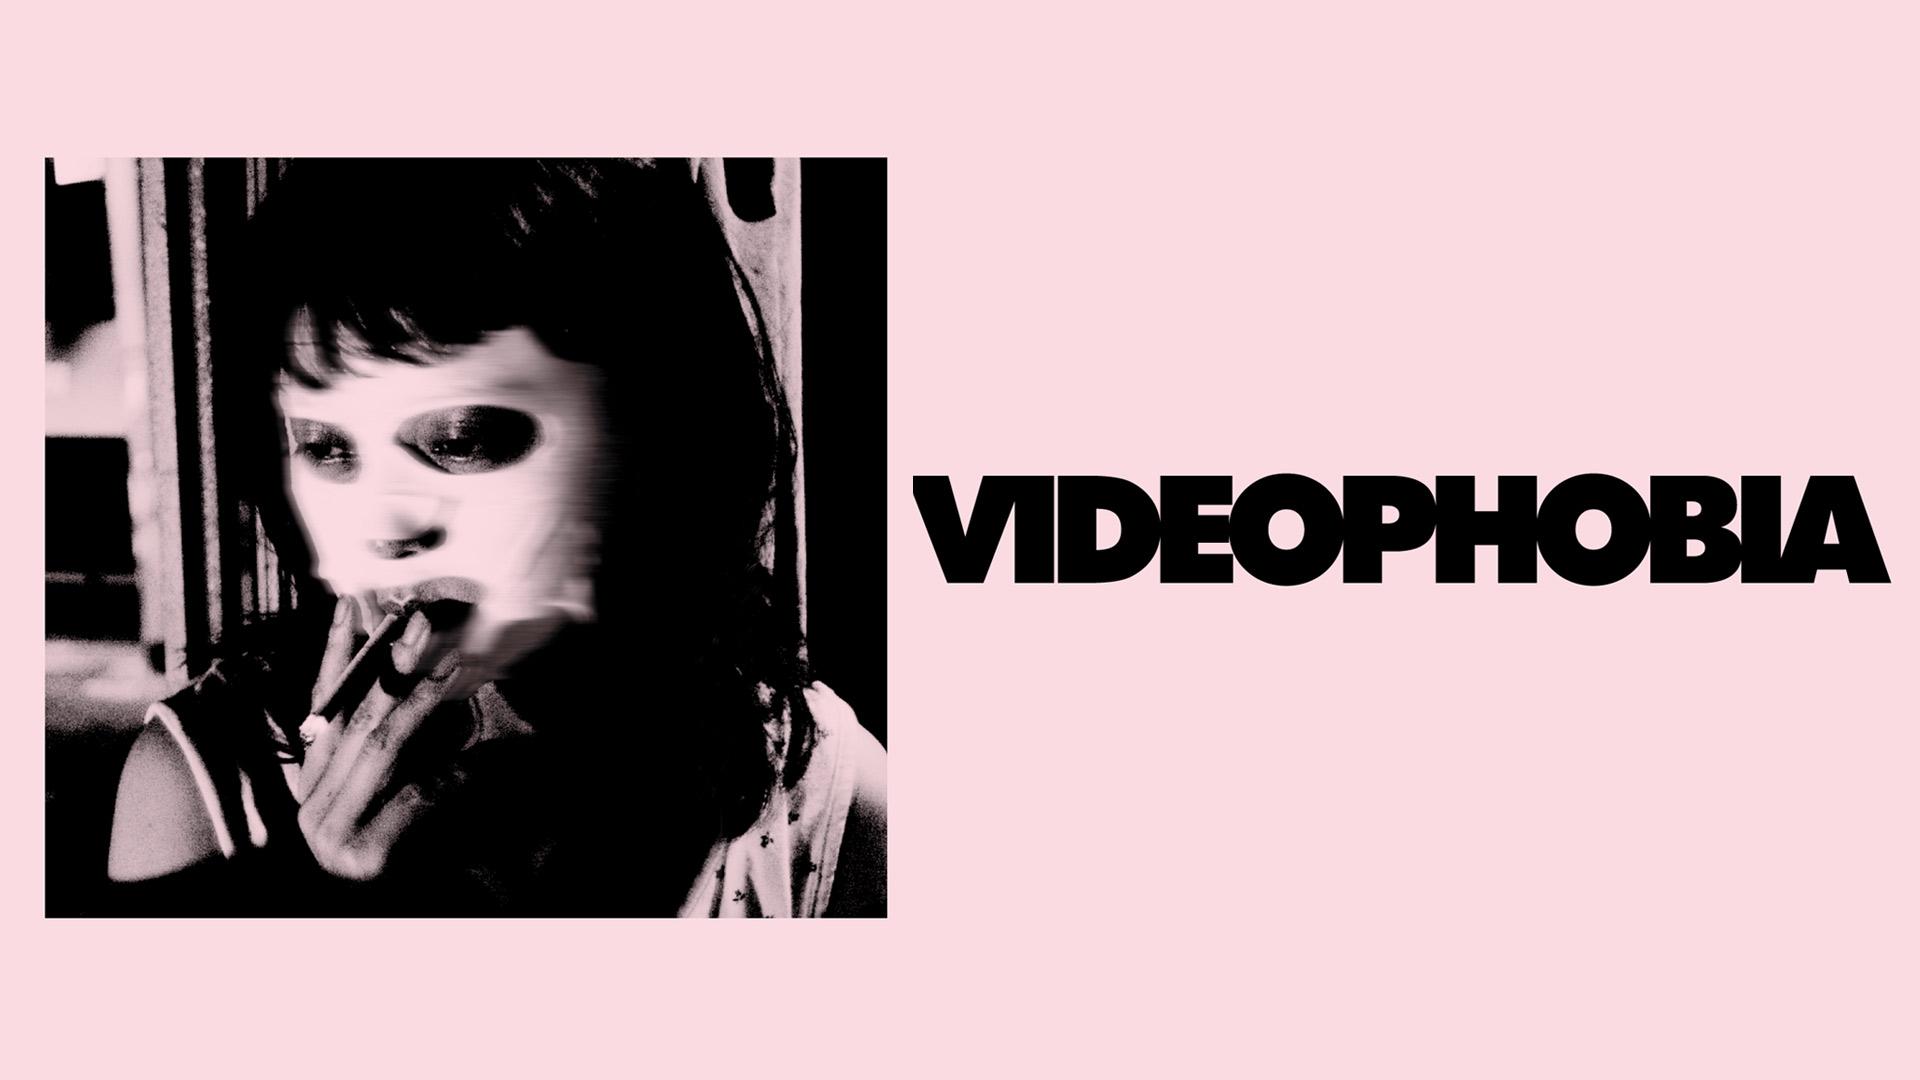 VIDEOPHOBIA